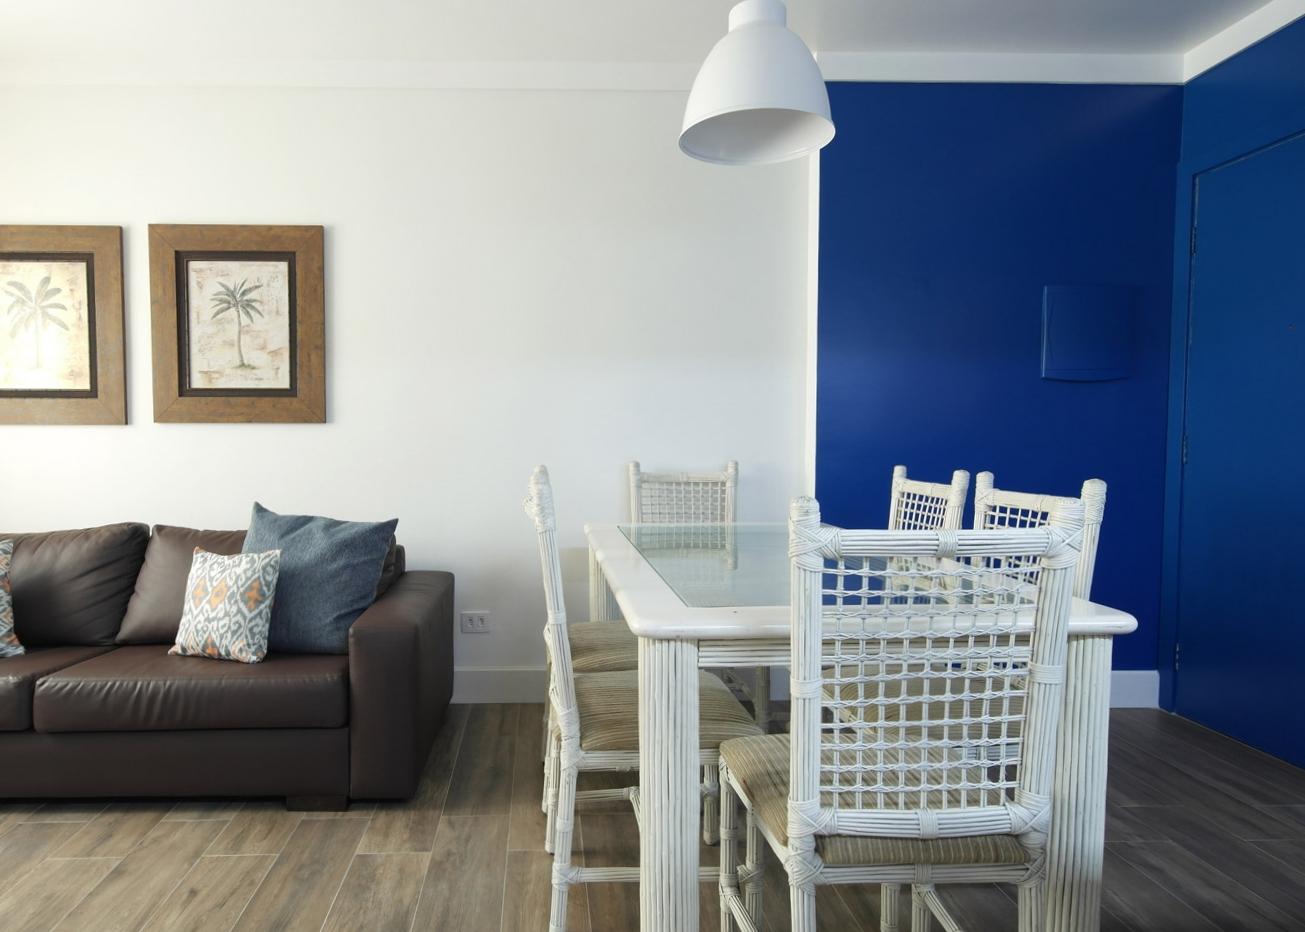 Daniela-Marques-Arquitetura-003-Sala-Pequena-Parede-Azul.jpg